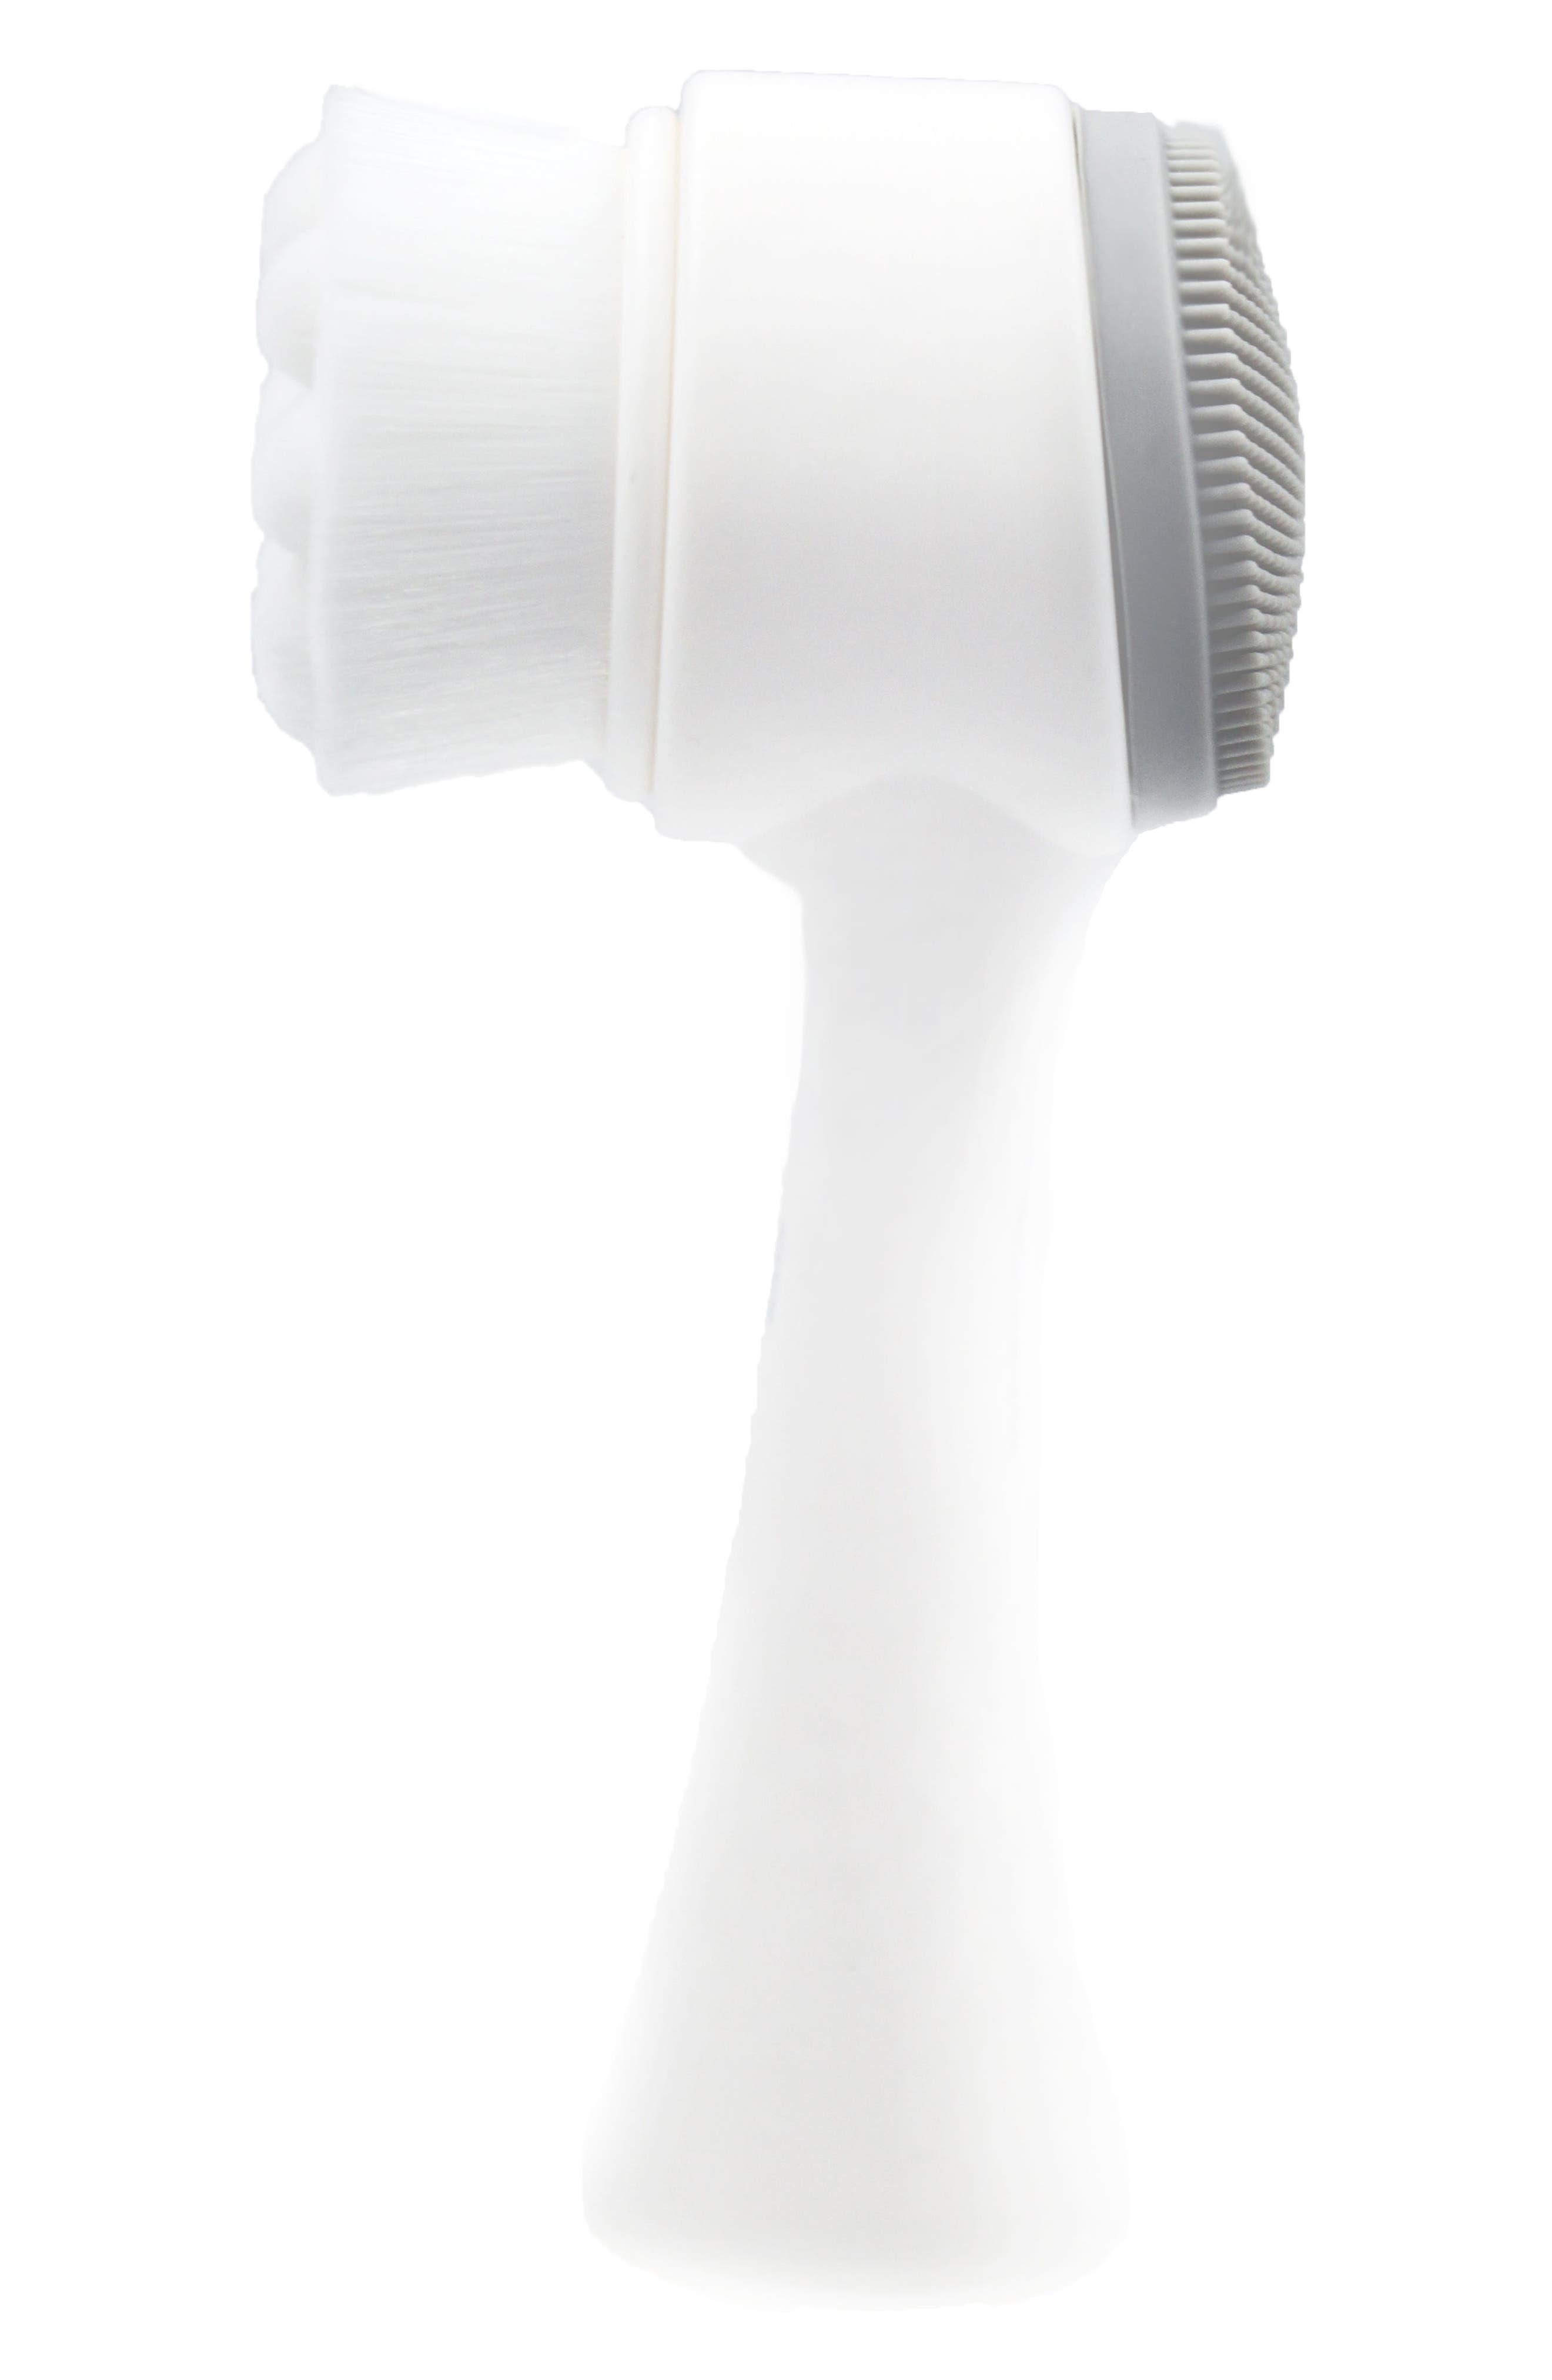 Main Image - Raffaele Ruberto® Dual-Head Pro Cleansing Brush